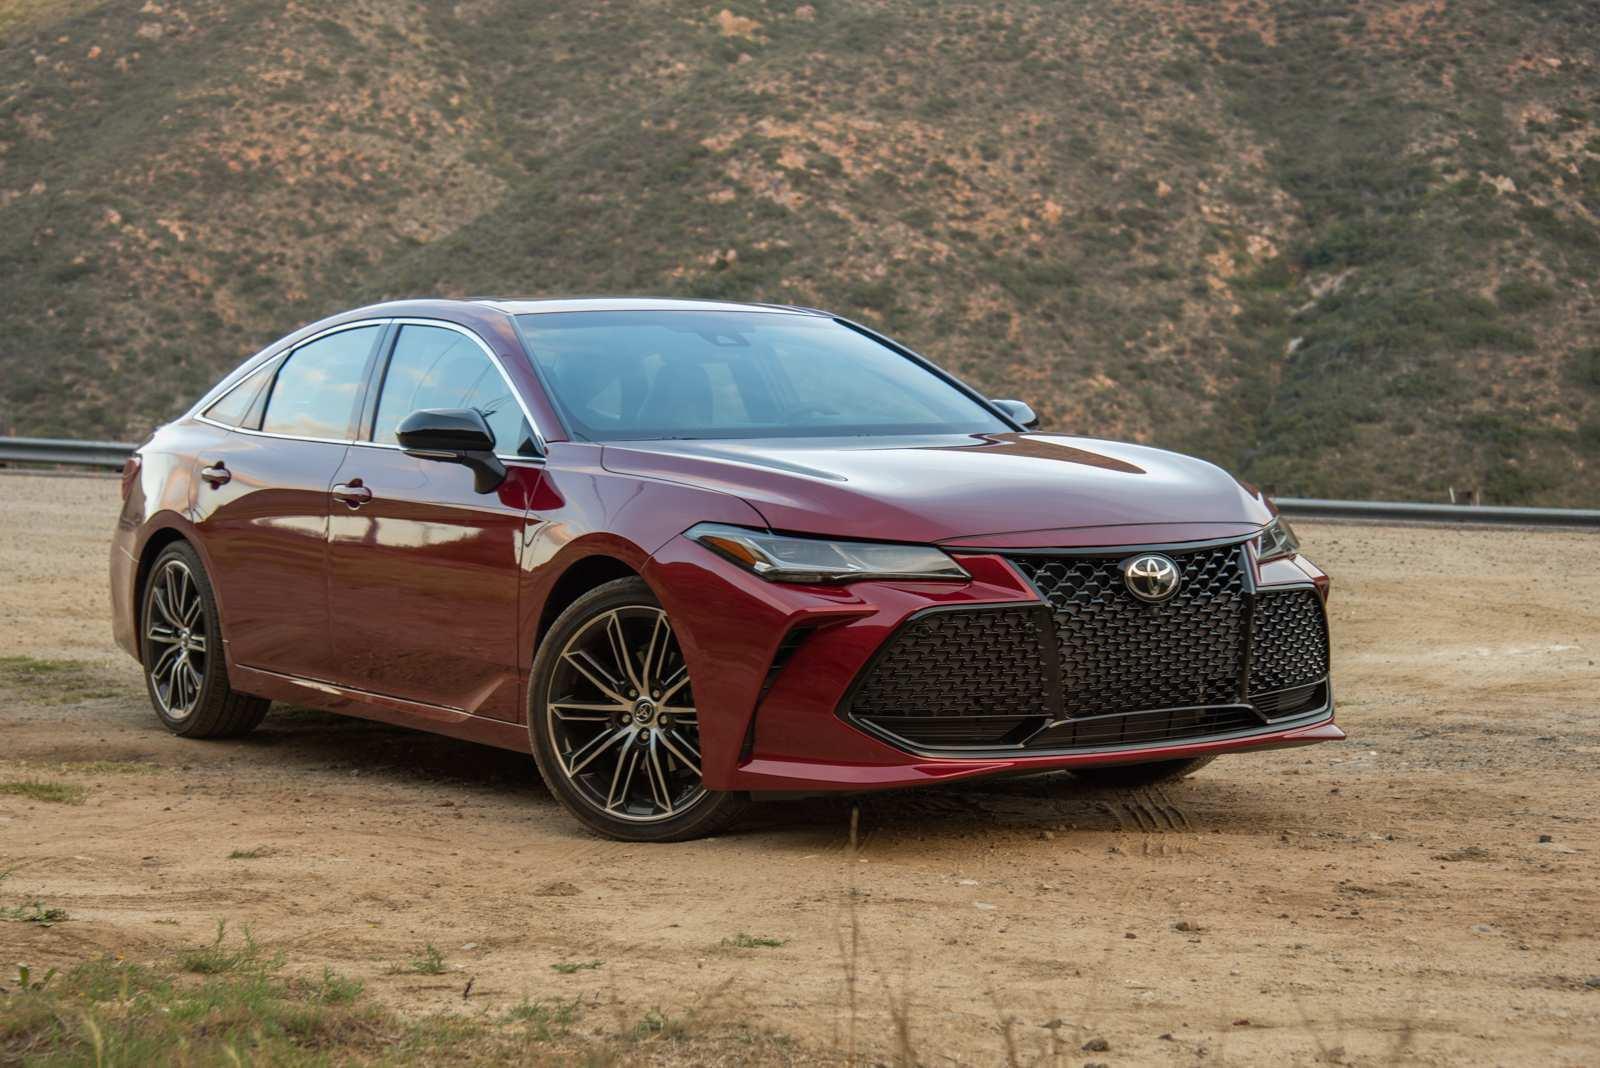 65 Great 2019 Toyota Avalon Specs by 2019 Toyota Avalon